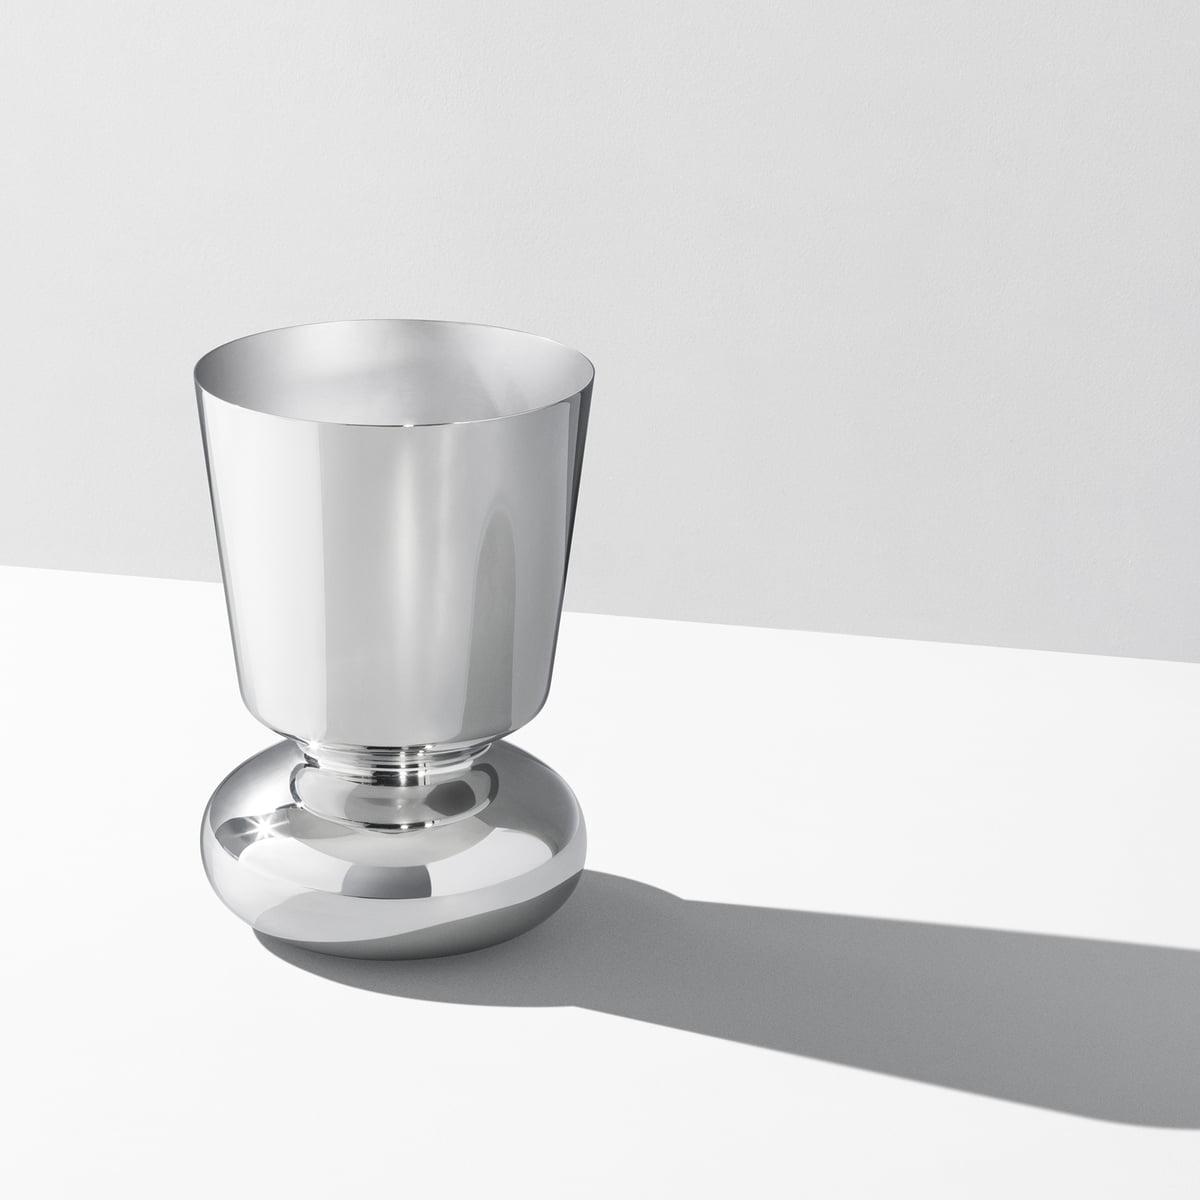 alfredo vase stainless steel by georg jensen - georg jensen  alfredo vase  stainless steel